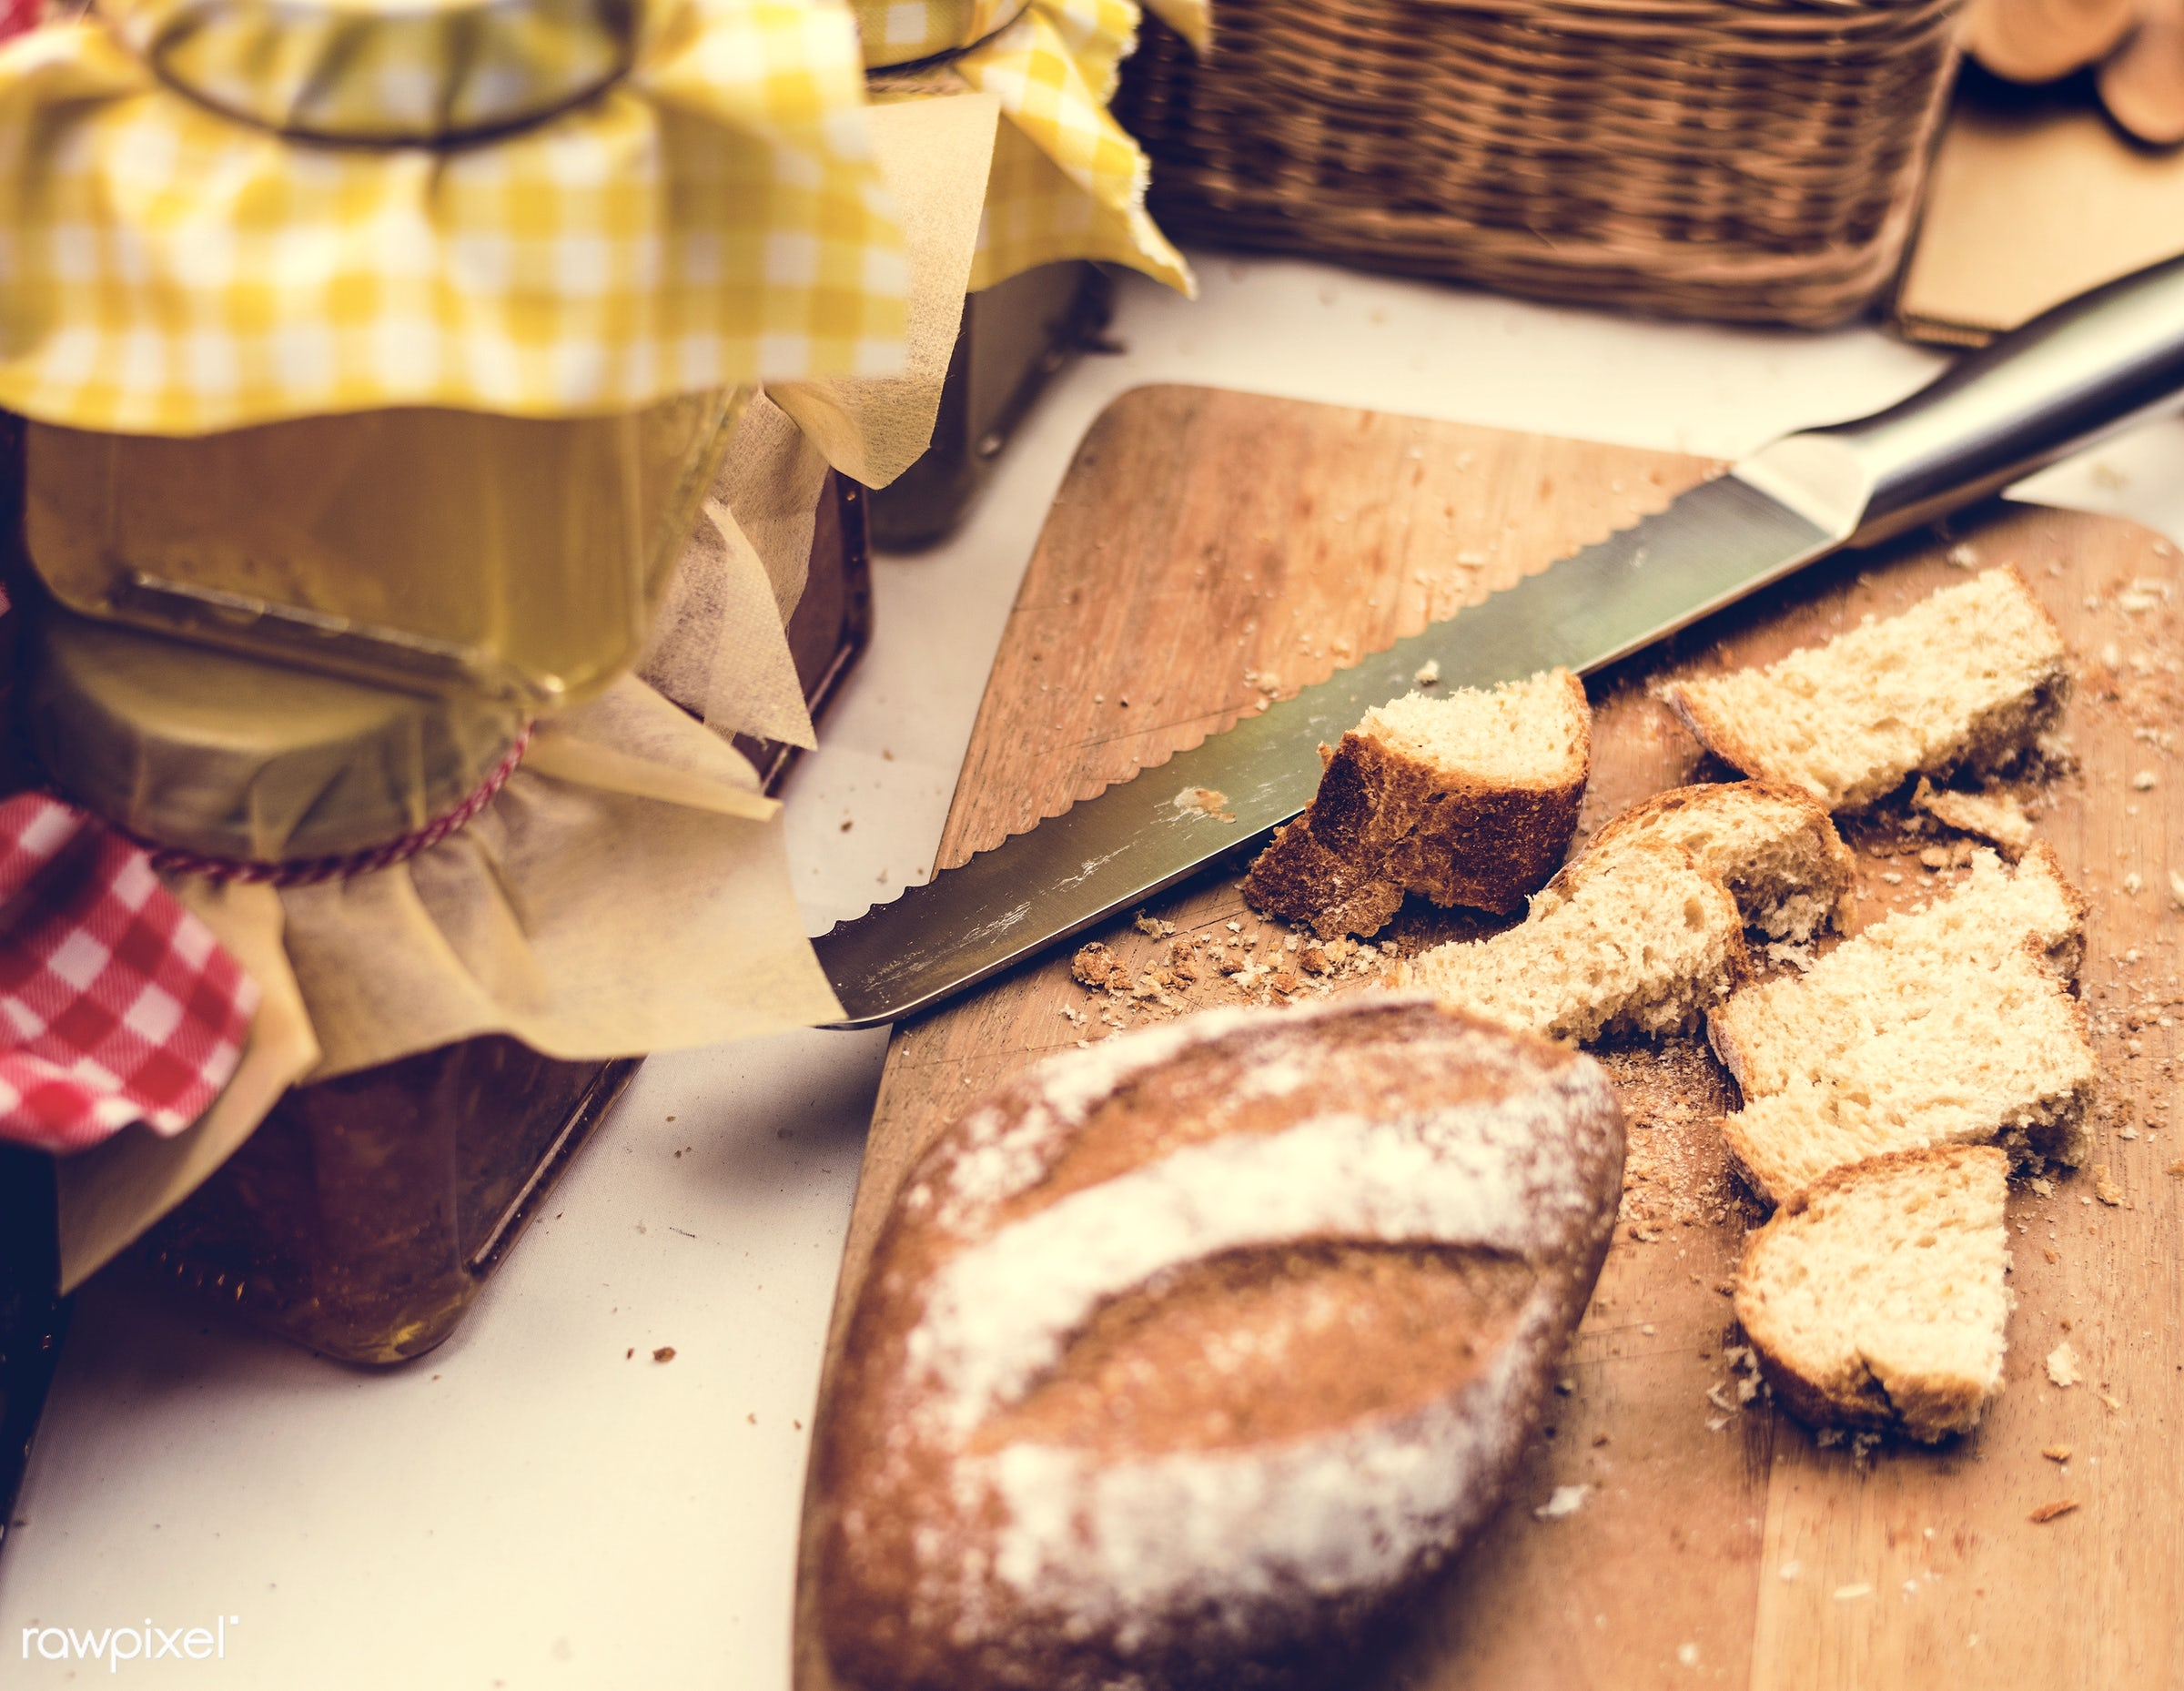 shop, cuisine, small business, variation, patissier, homemade, cute, baked, bread house, bakery, dough, jar, bread, bread...